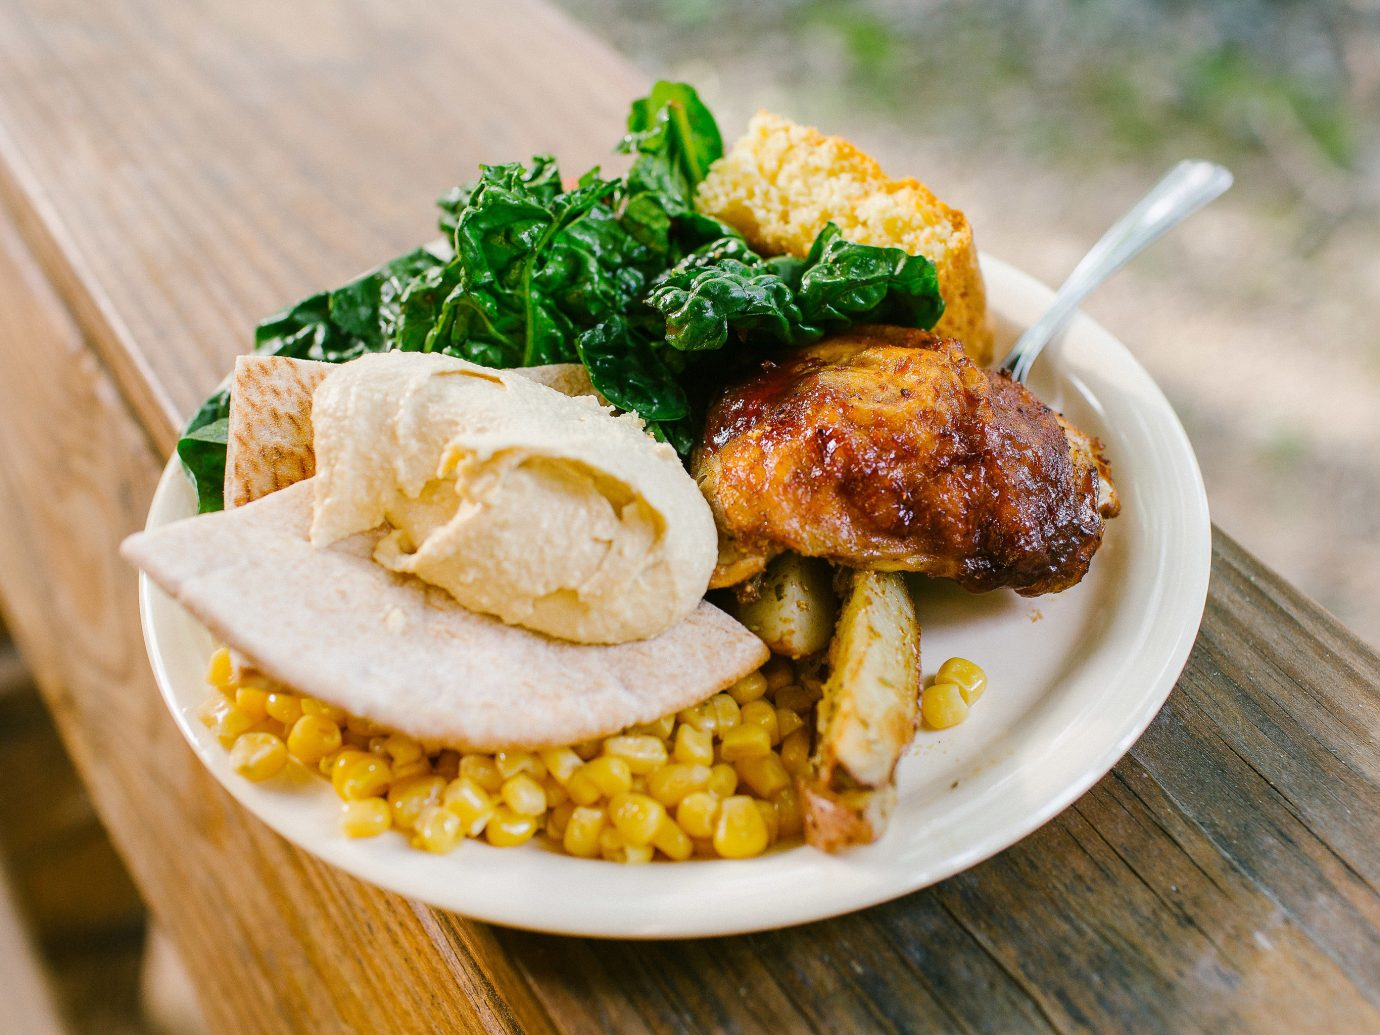 Offbeat food table plate dish wooden fried food vegetarian food cuisine recipe meal